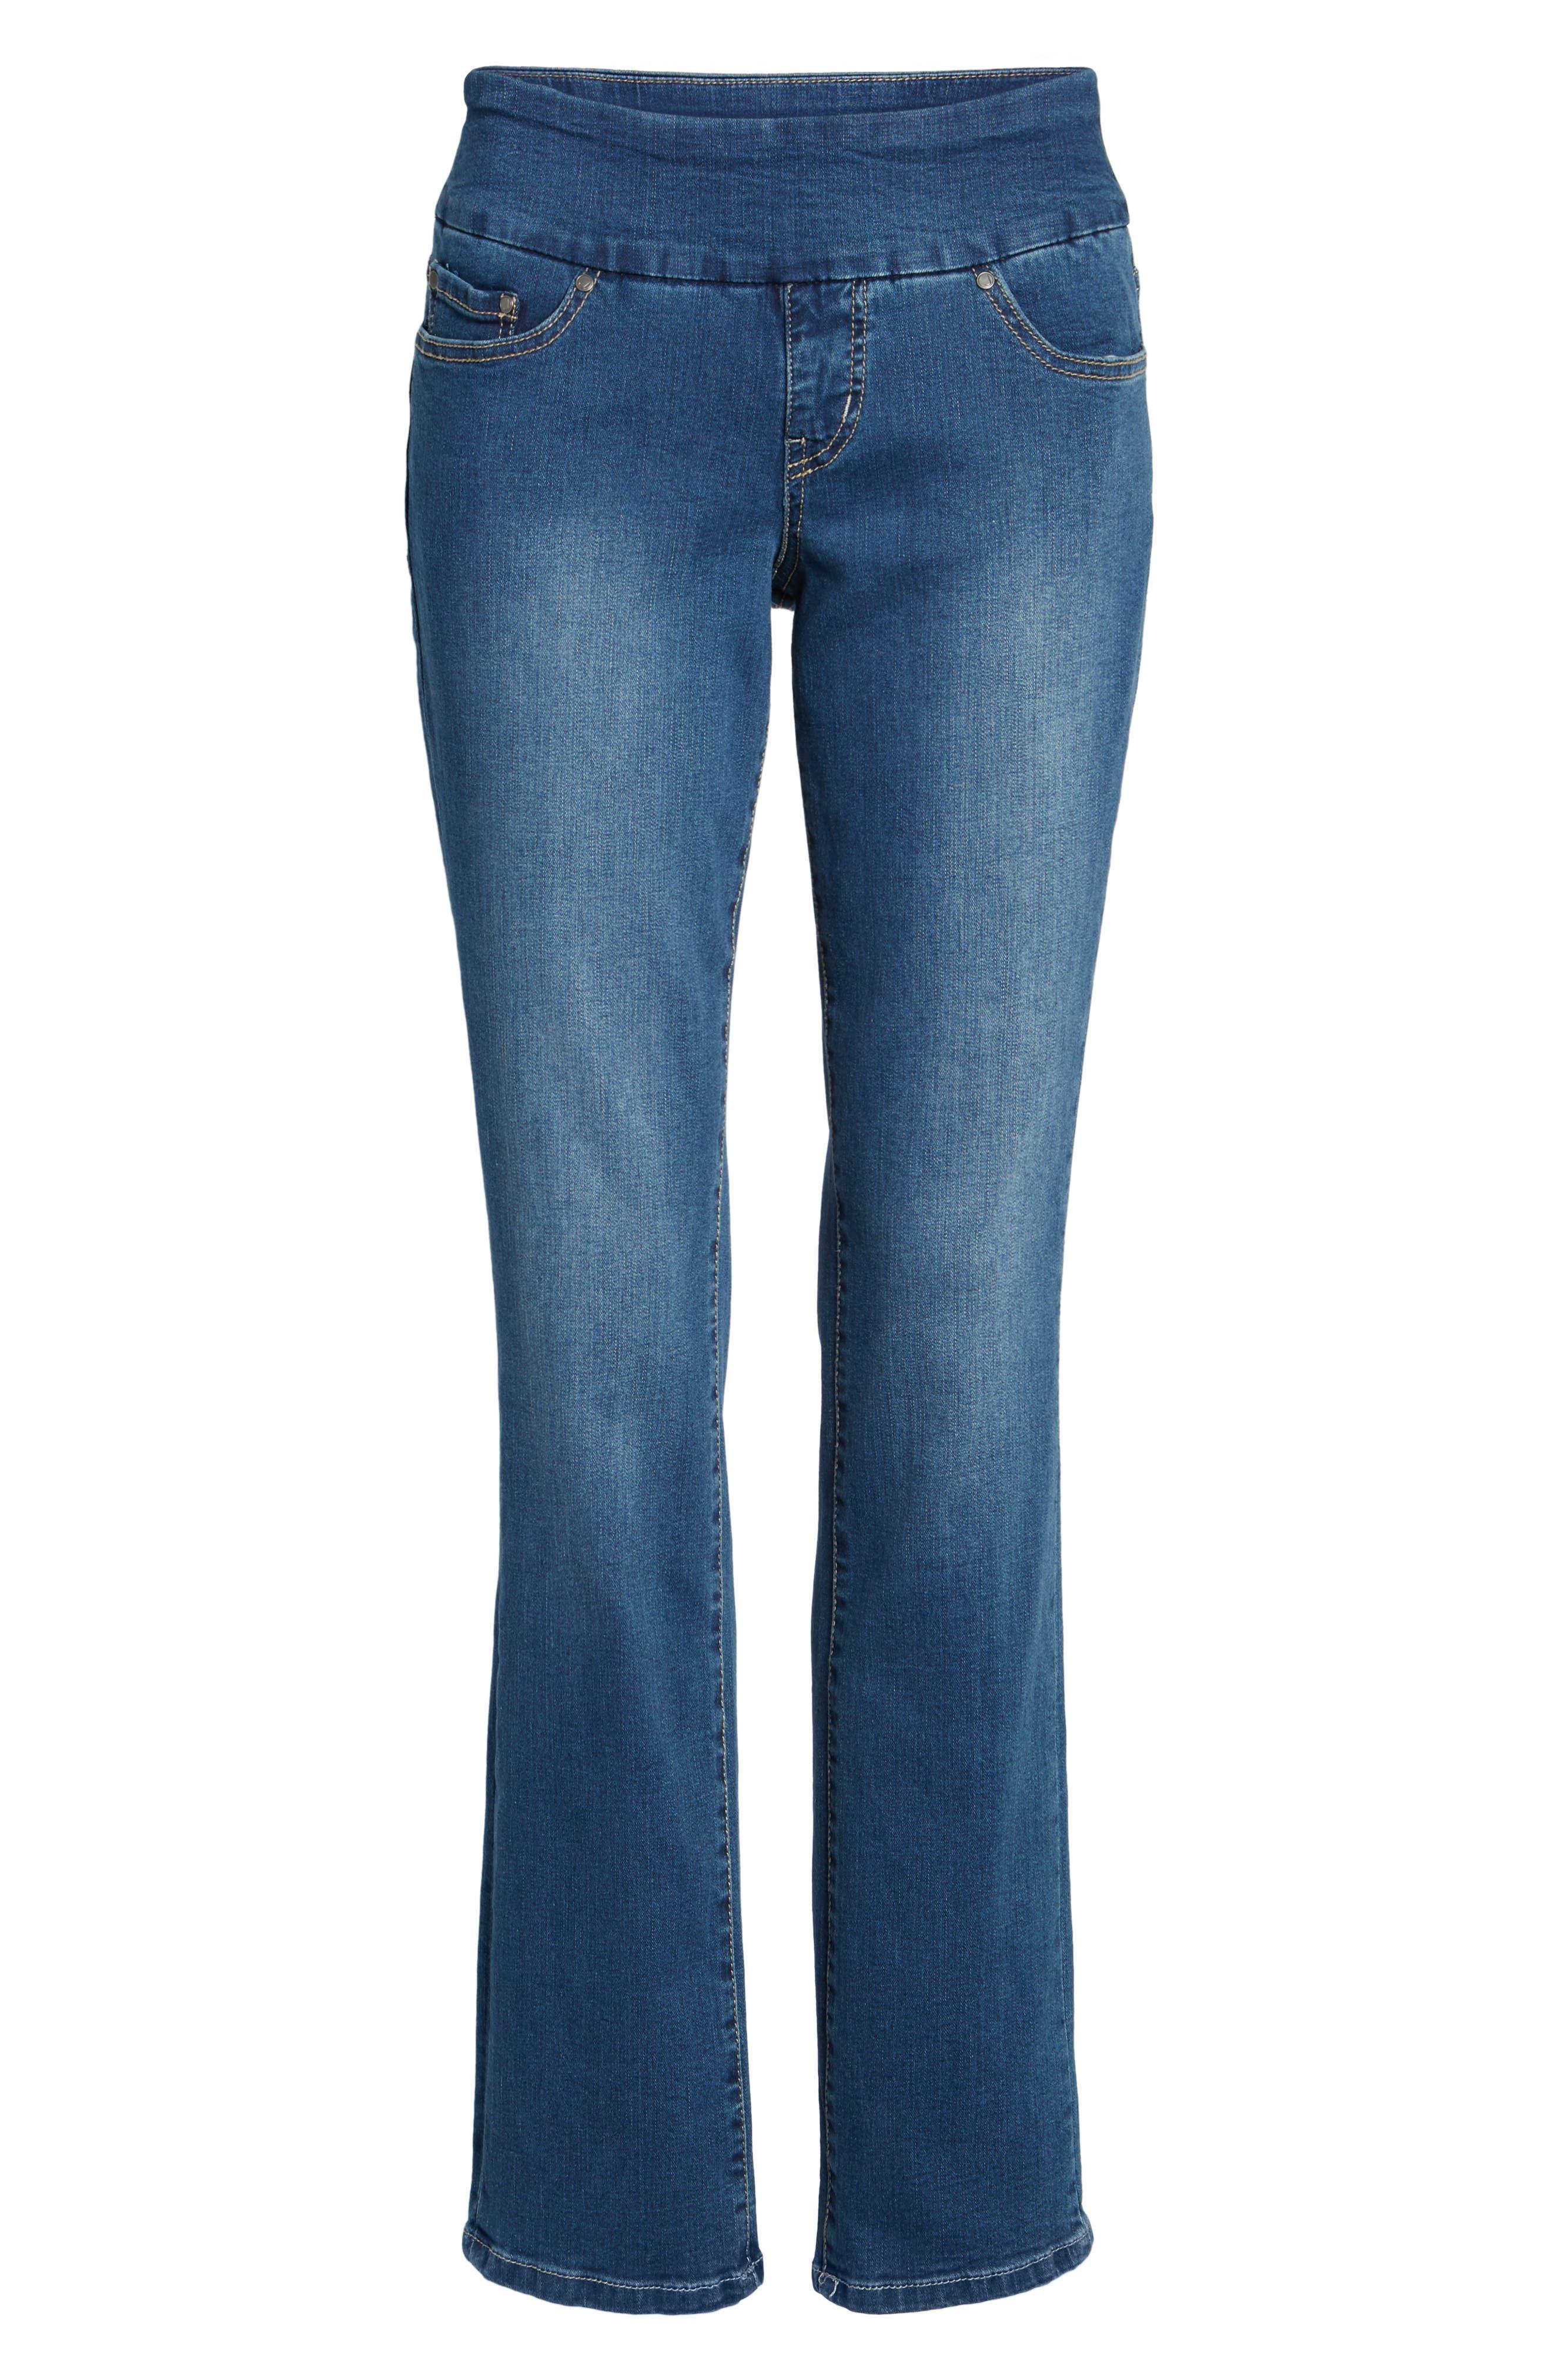 JAG JEANS, Peri Pull-On Straight Leg Jeans, Alternate thumbnail 6, color, MEDIUM INDIGO